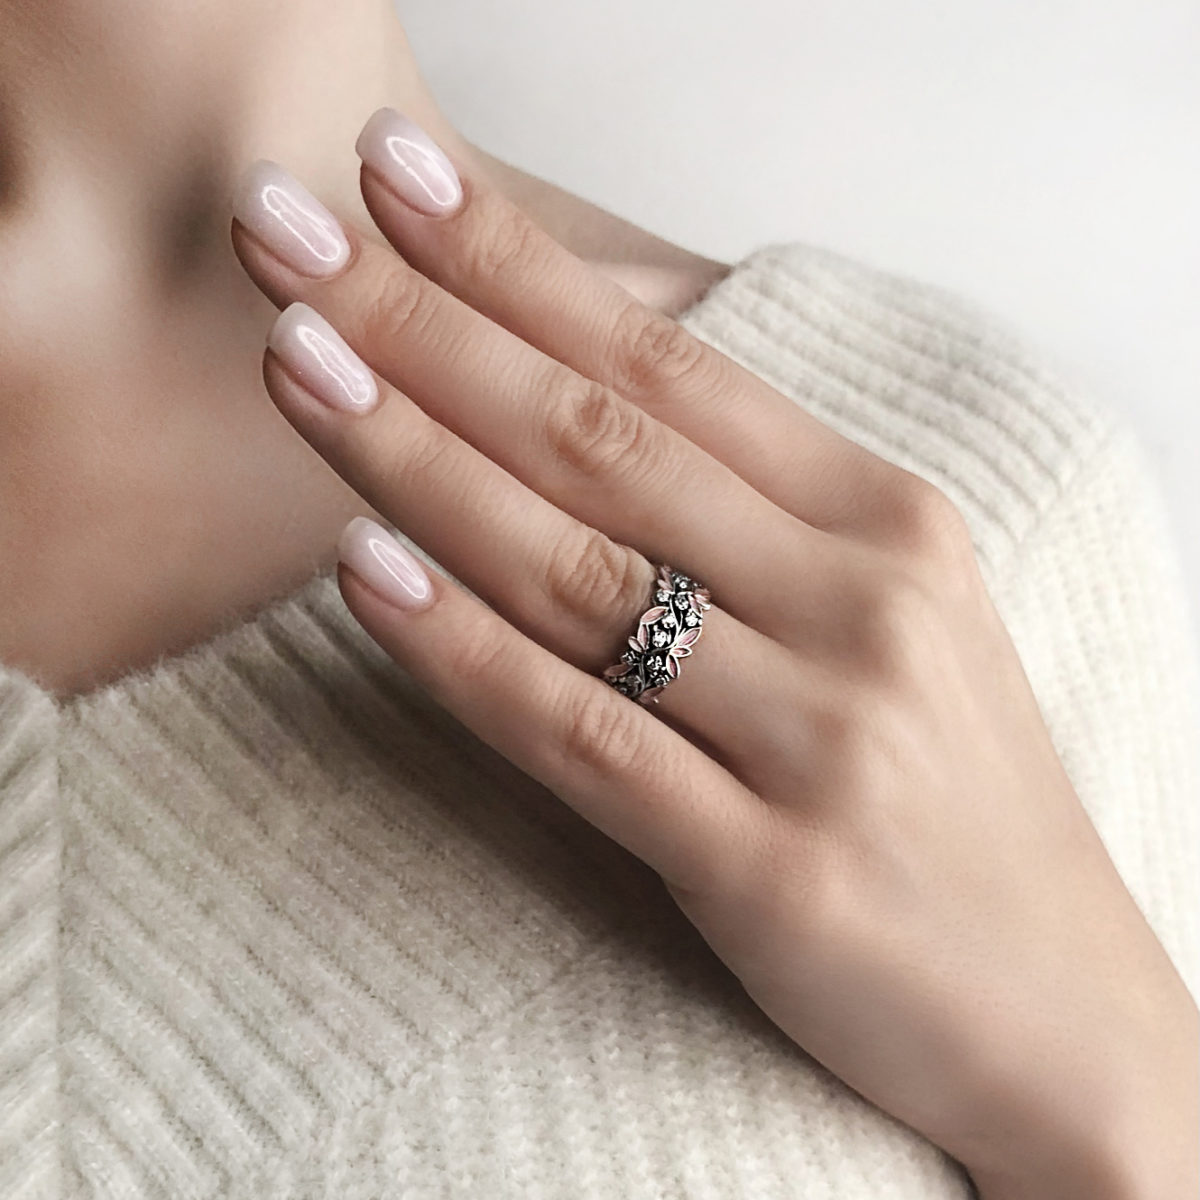 kolczo rosinka rozovaya kvadrat 1200x1200 - Кольцо из серебра «Росинка», розовое с фианитами